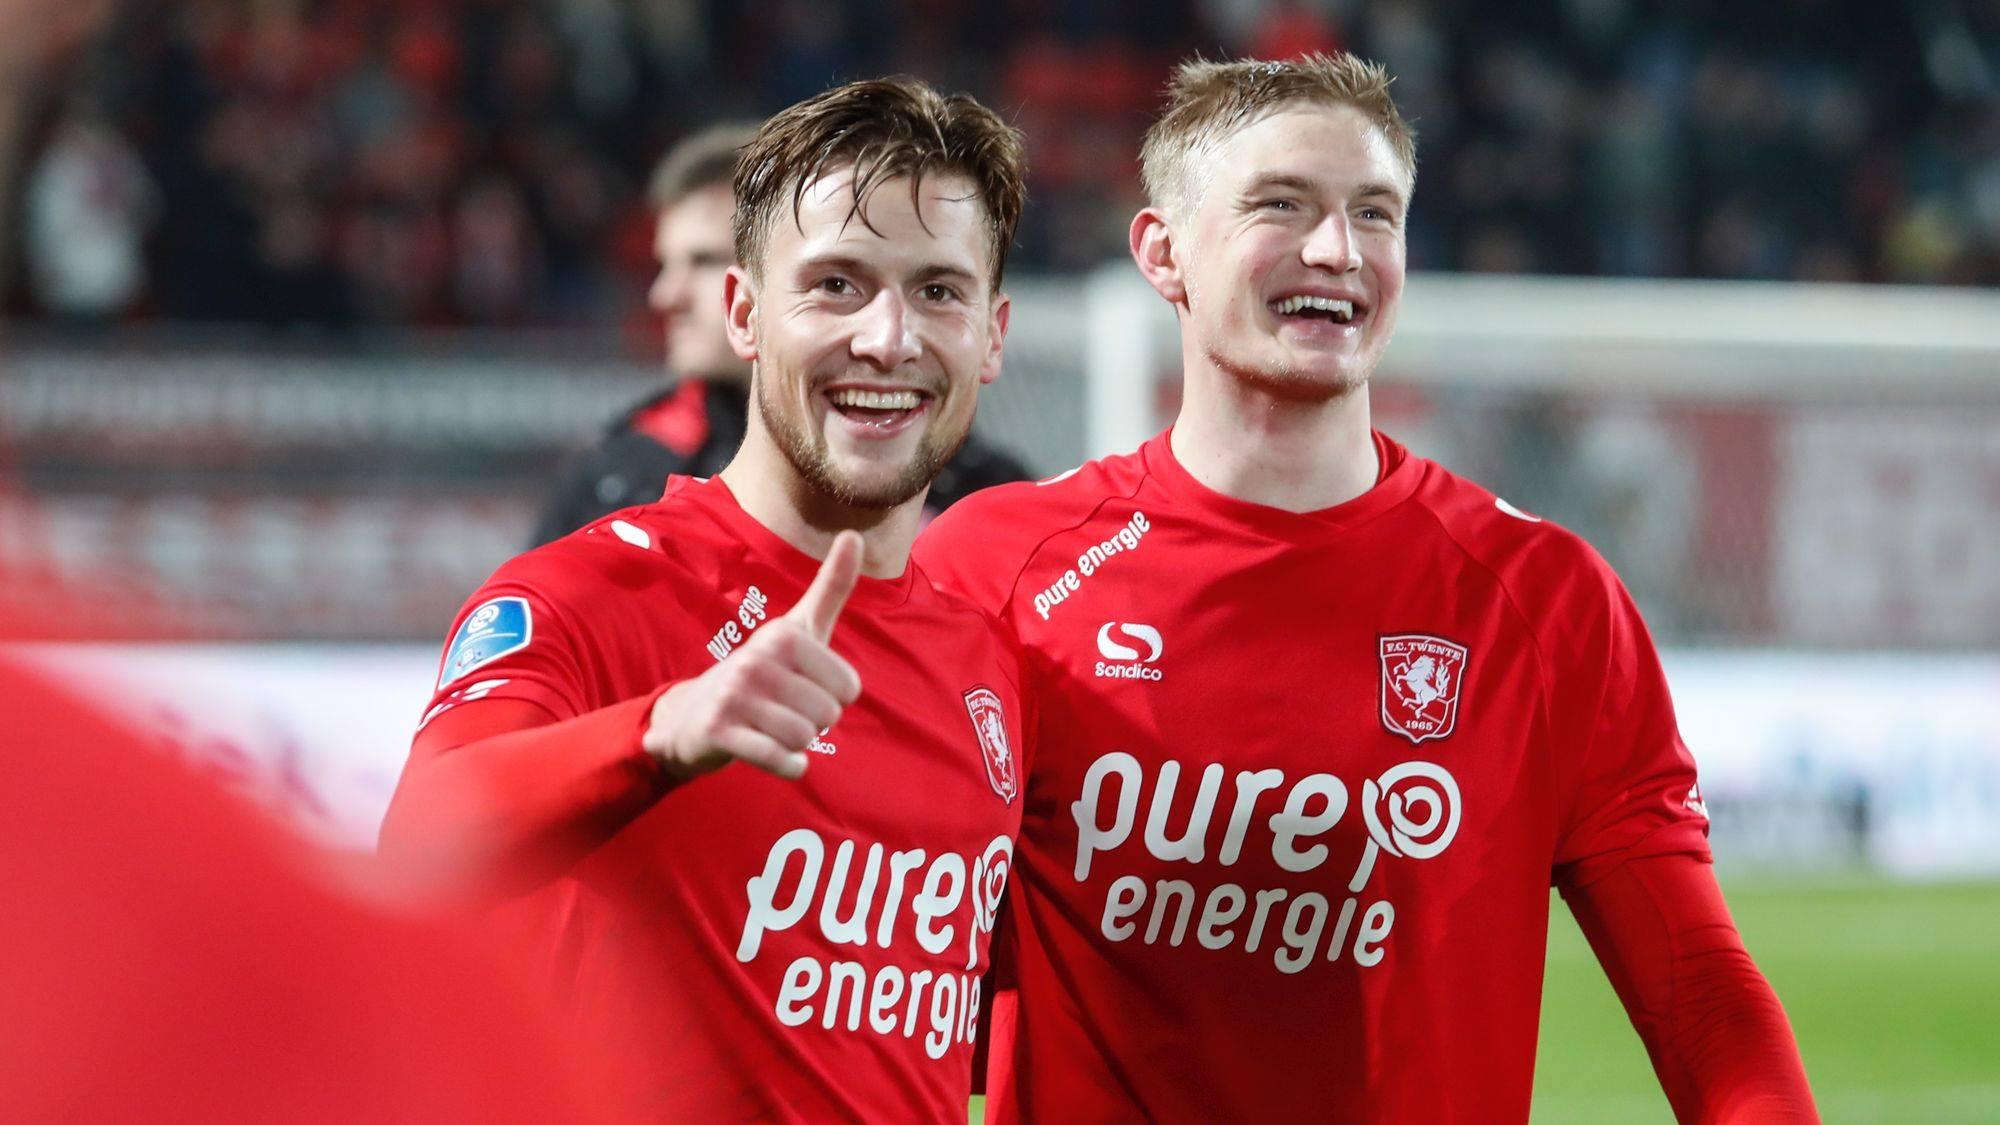 Eredivisie - Twente - Heracles - pronostico -20 settembre